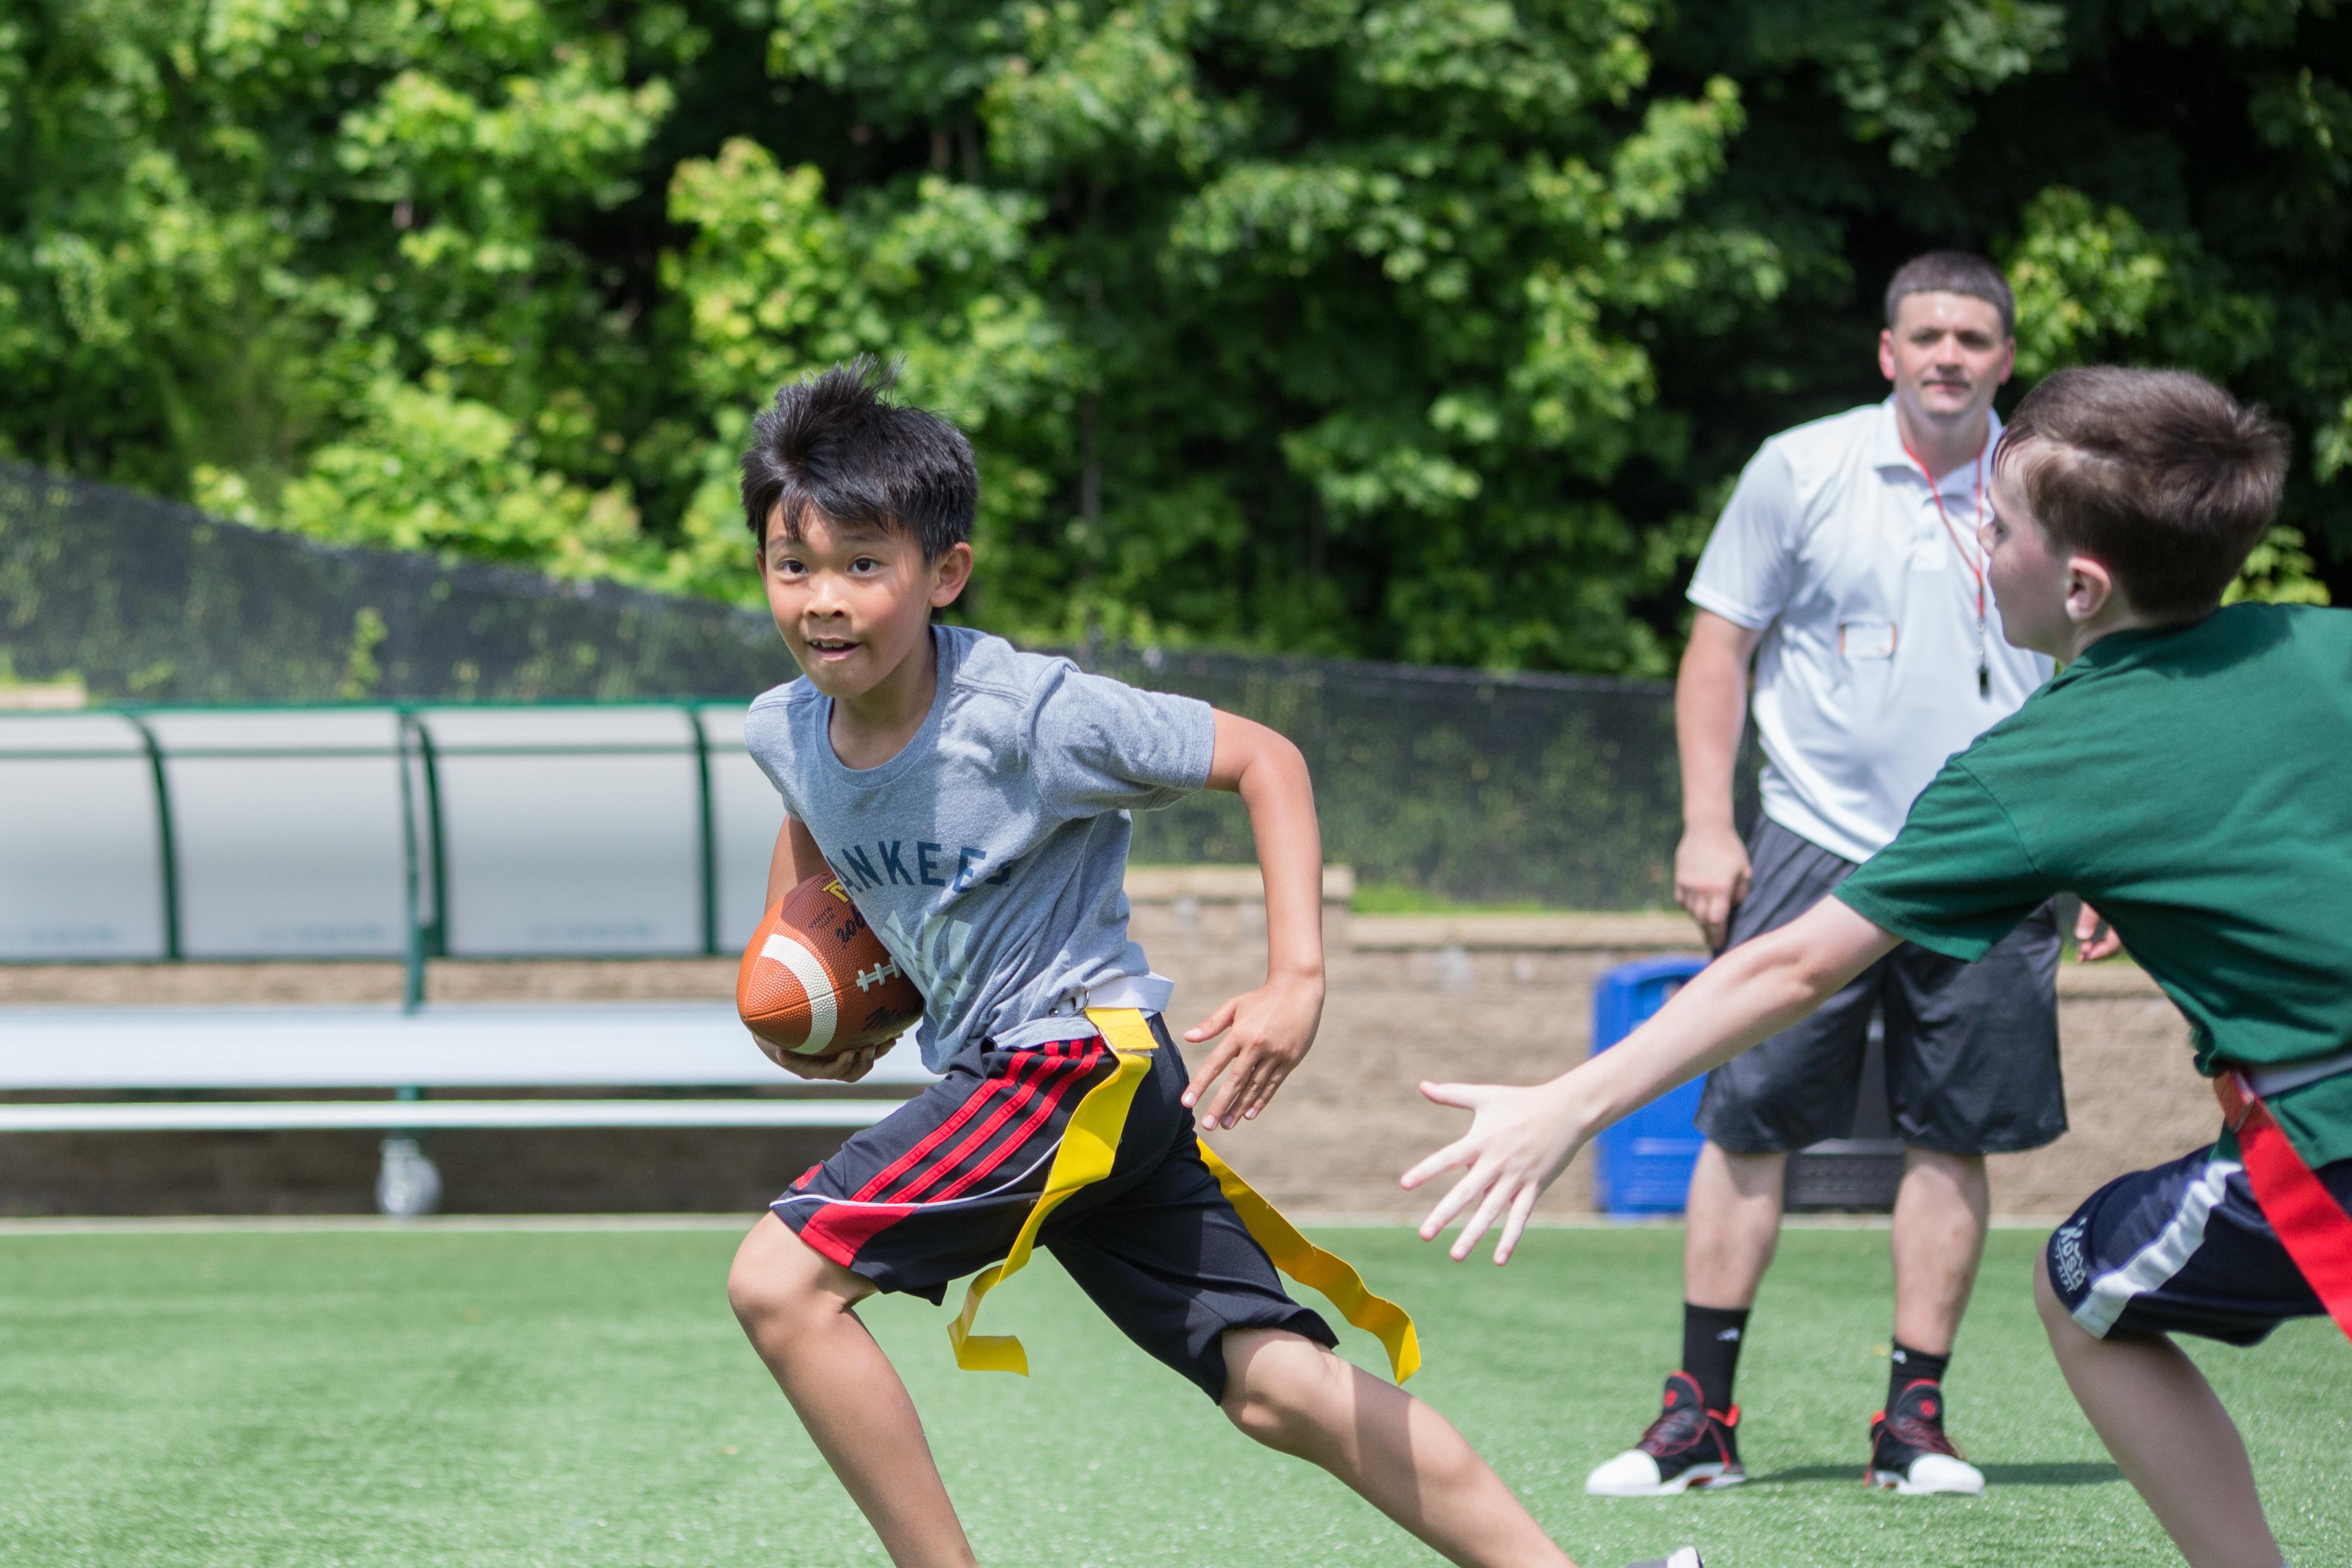 Soccer Summer Camp | World Sports Camp |Sports Camp